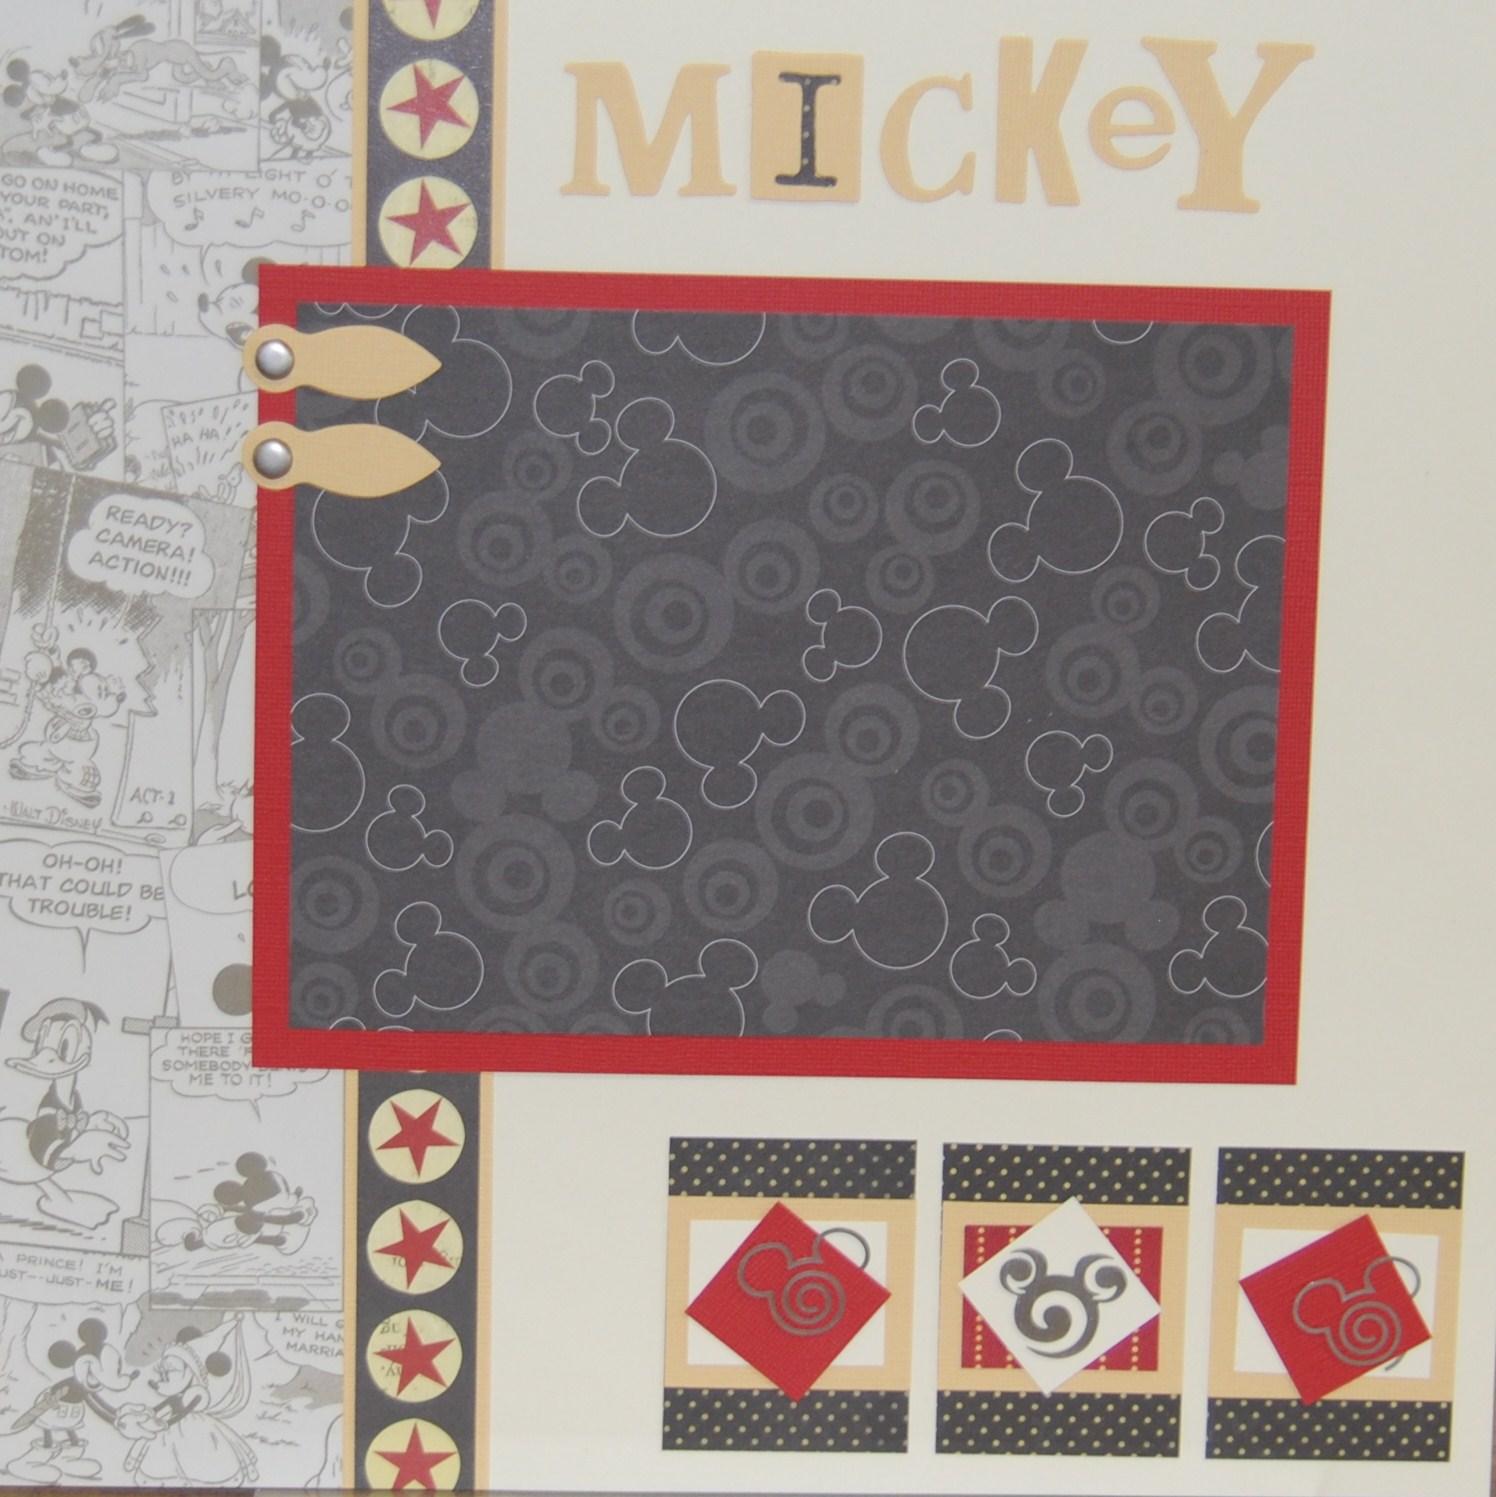 How to scrapbook disney - How To Scrapbook Disney 20